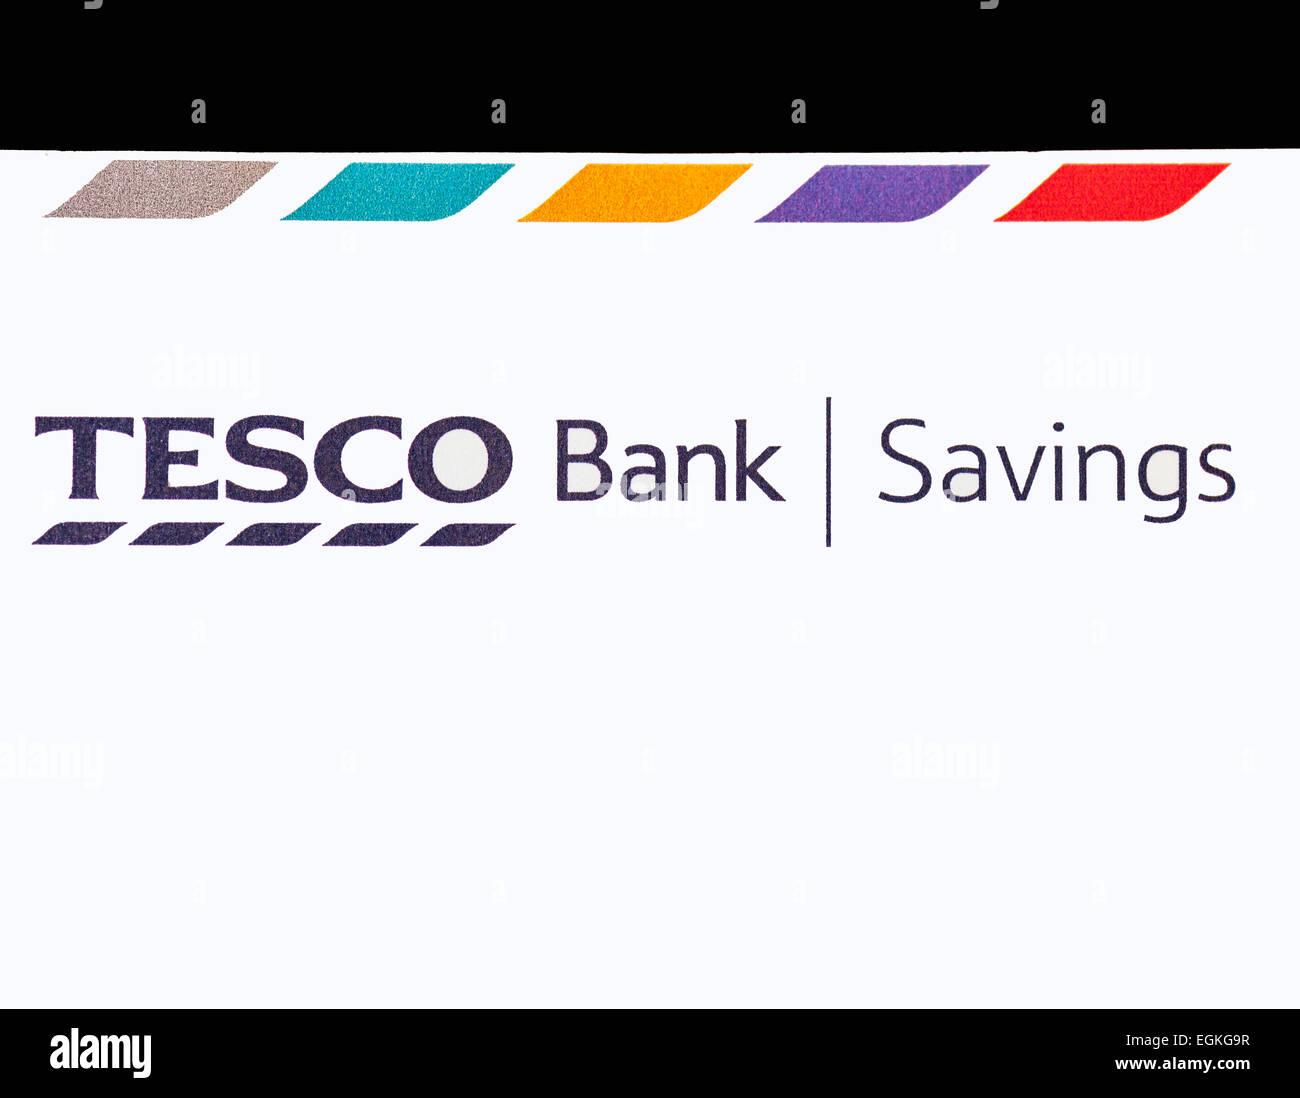 Tesco Bank Savings account - Stock Image